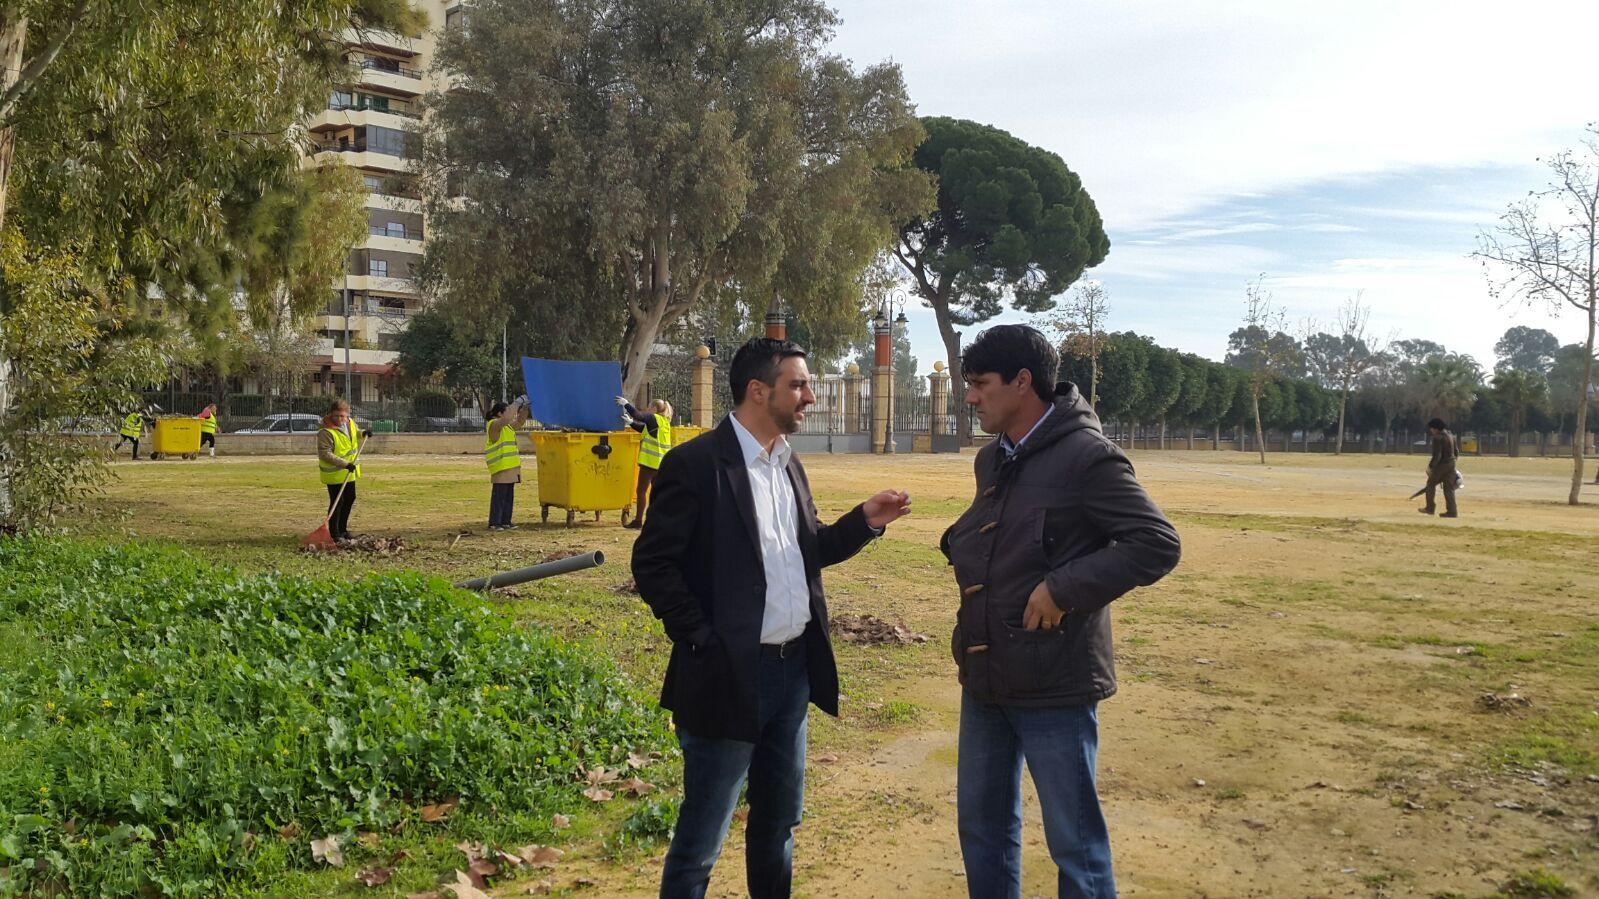 Jose_Antonio_Diaz-Gonzalez_Hontoria-cuadrillas_barriadas